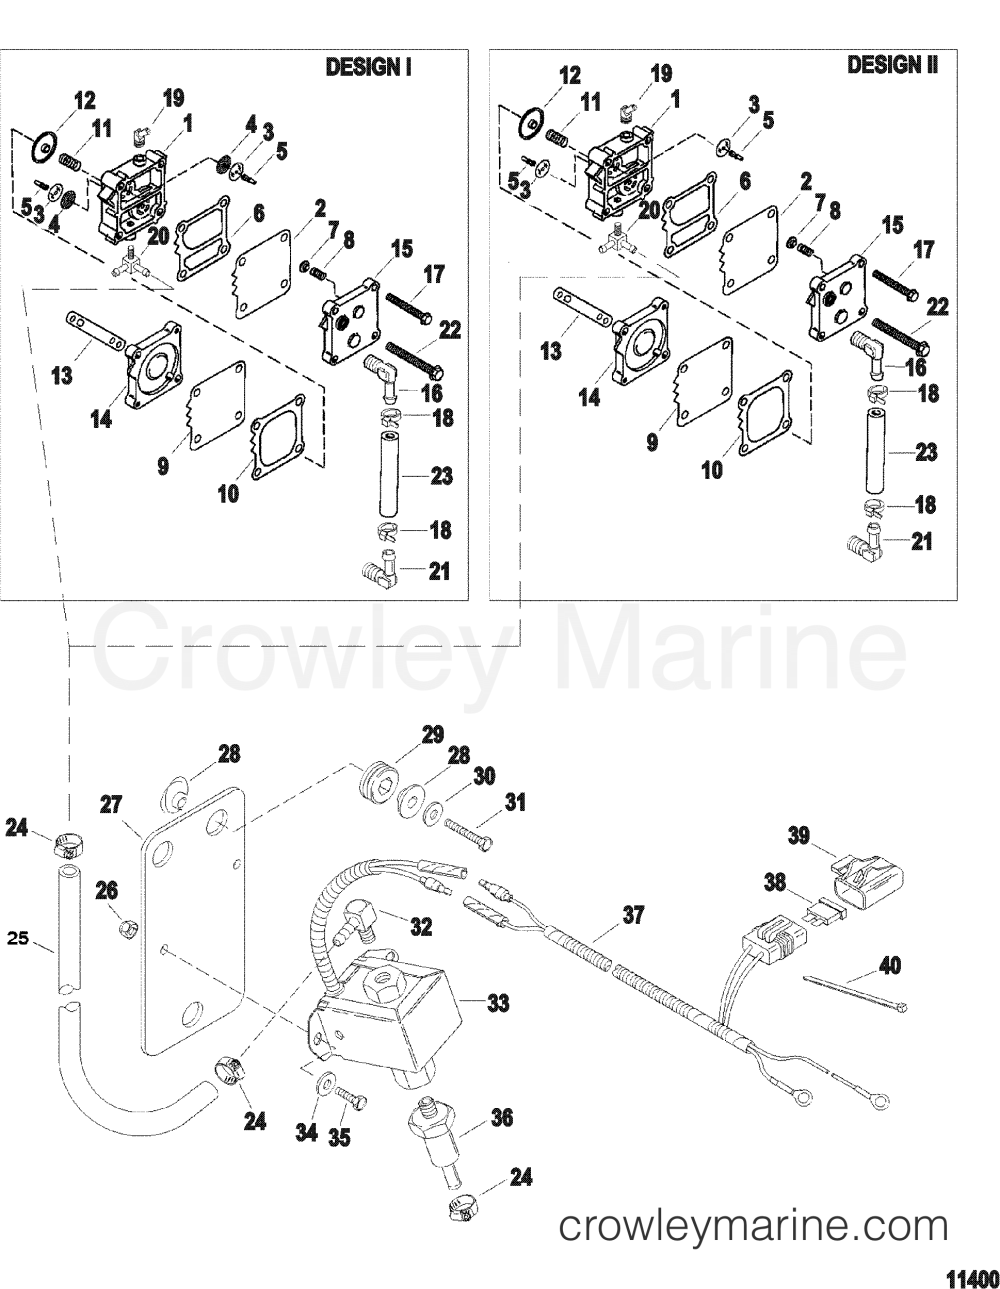 medium resolution of mercury sport jet diagram wiring diagram goulds shallow well jet pump diagram goulds shallow well jet pump diagram